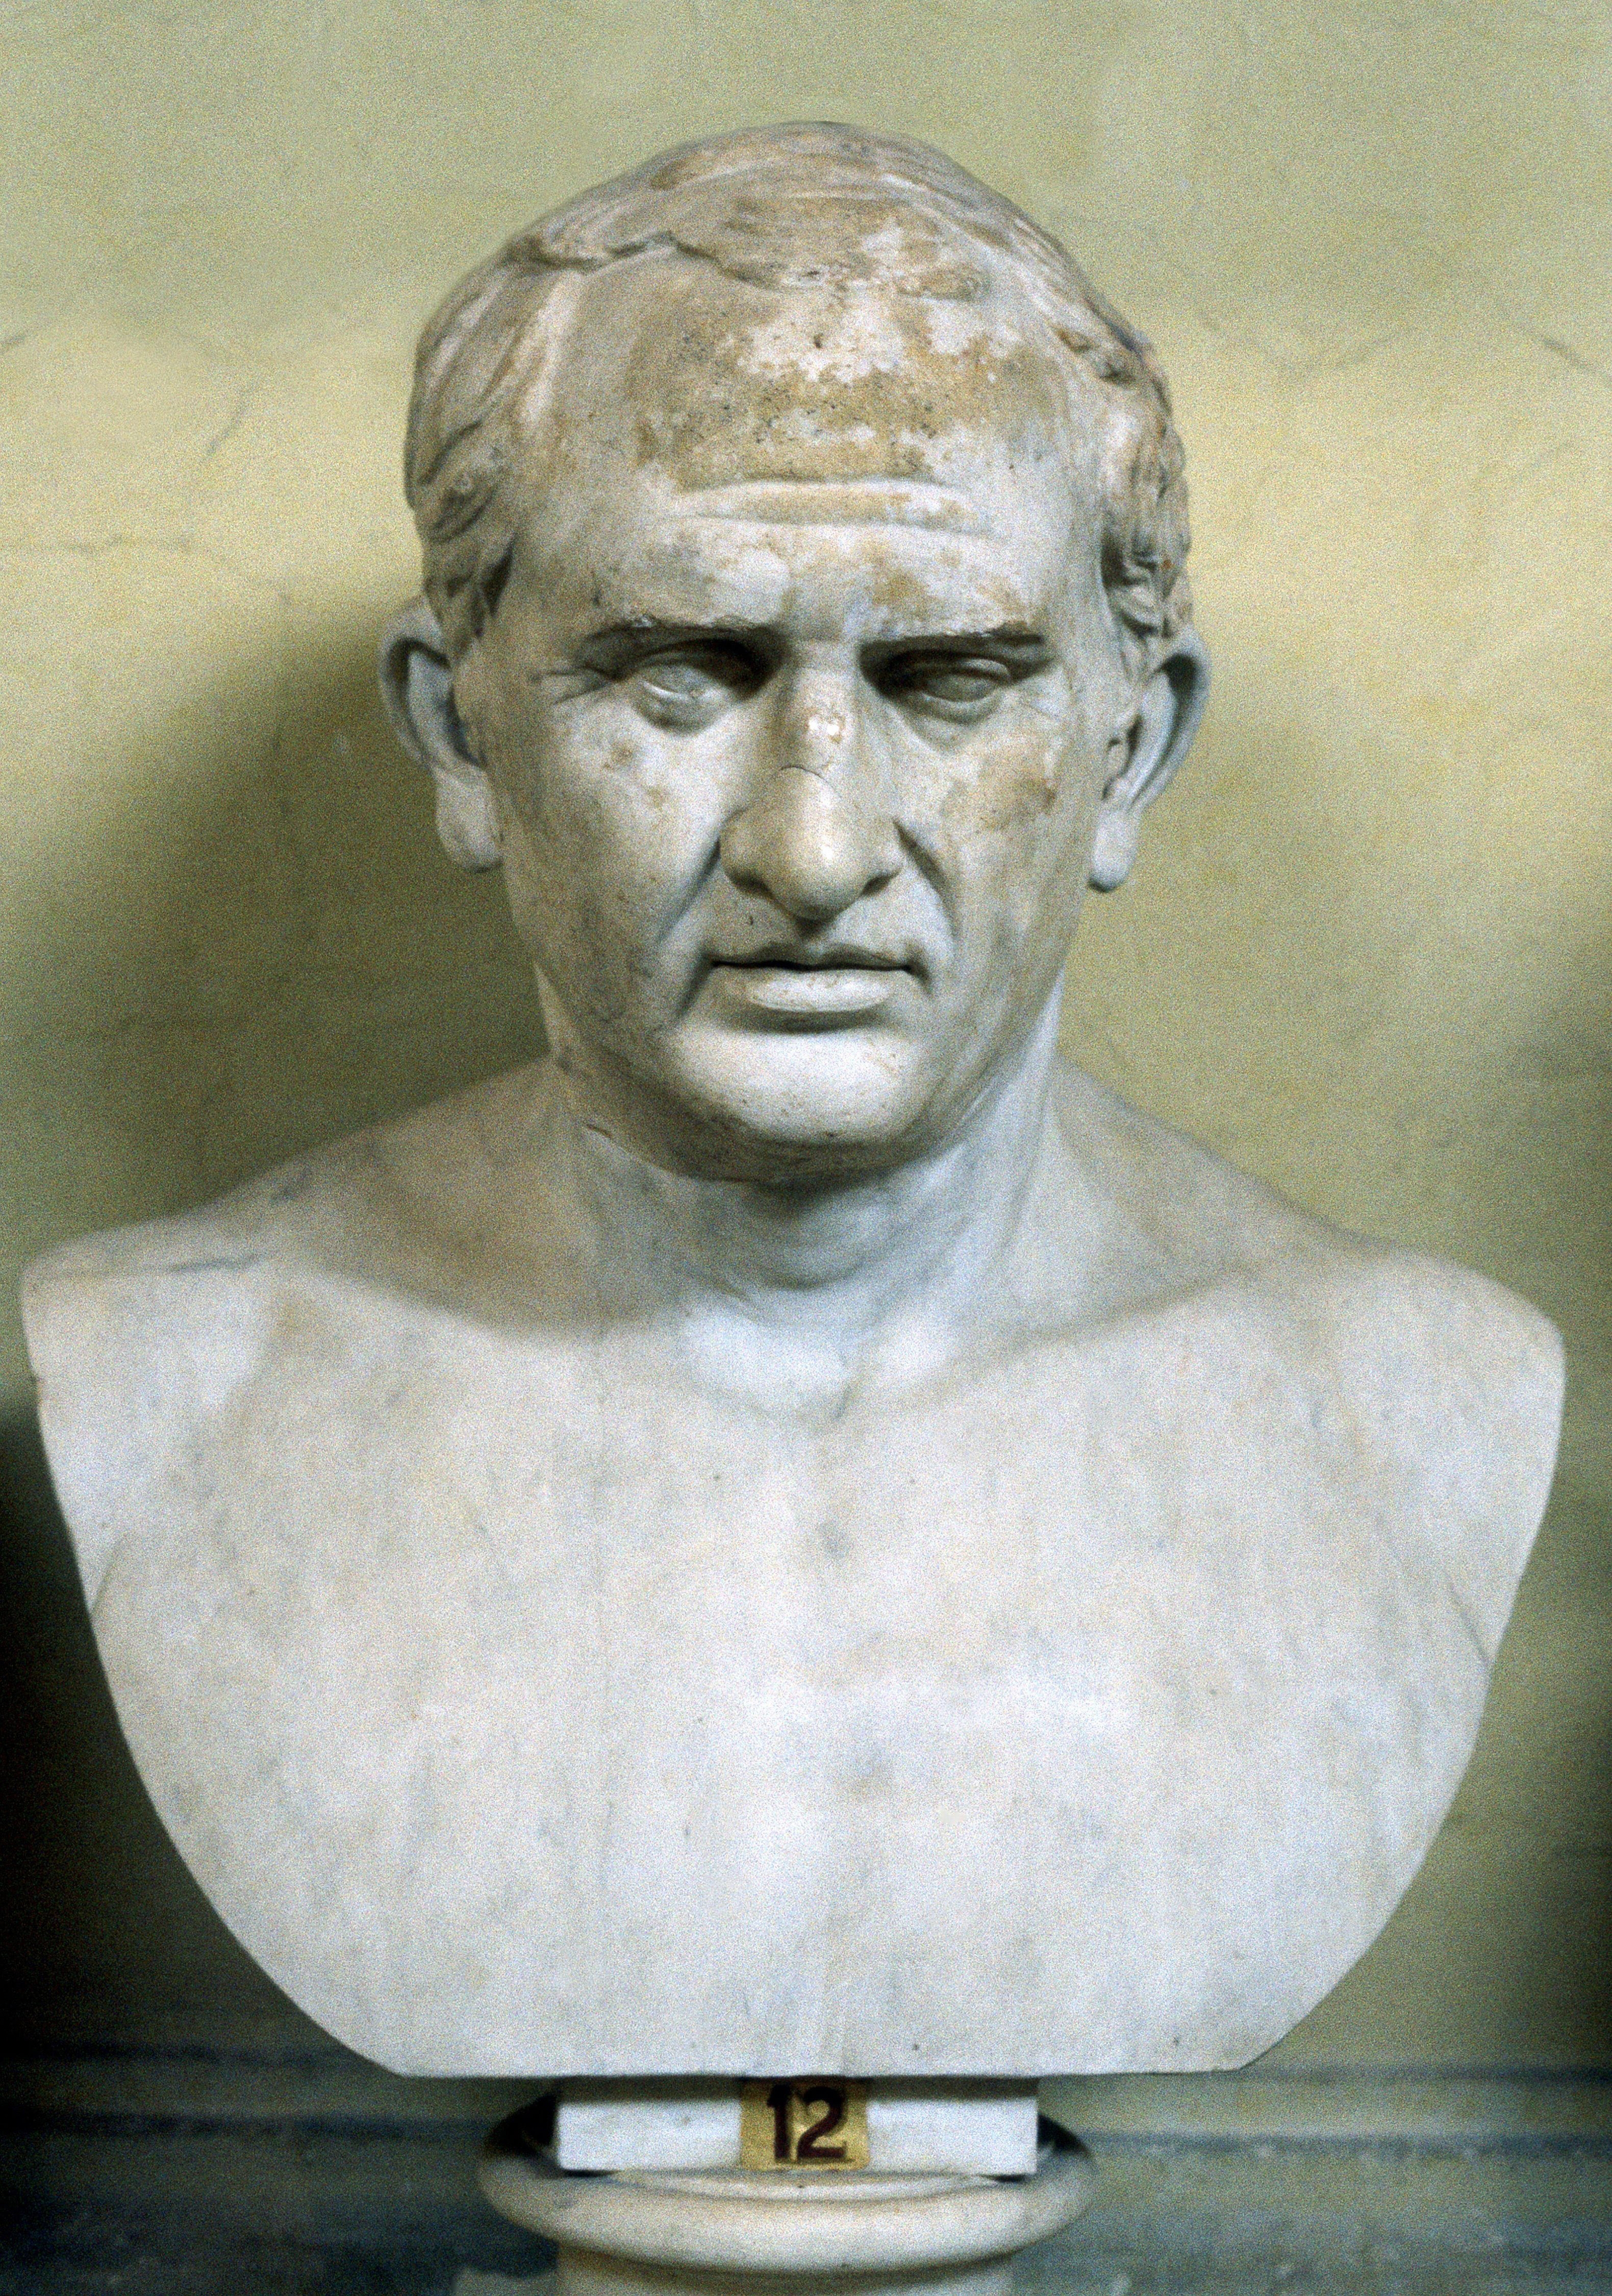 marcus tullius cicero essay Marcus tullius cicero (106-43 bc) was a roman statesman and philosopher  he wrote de senectute (on old age) in 44 bc when he was.